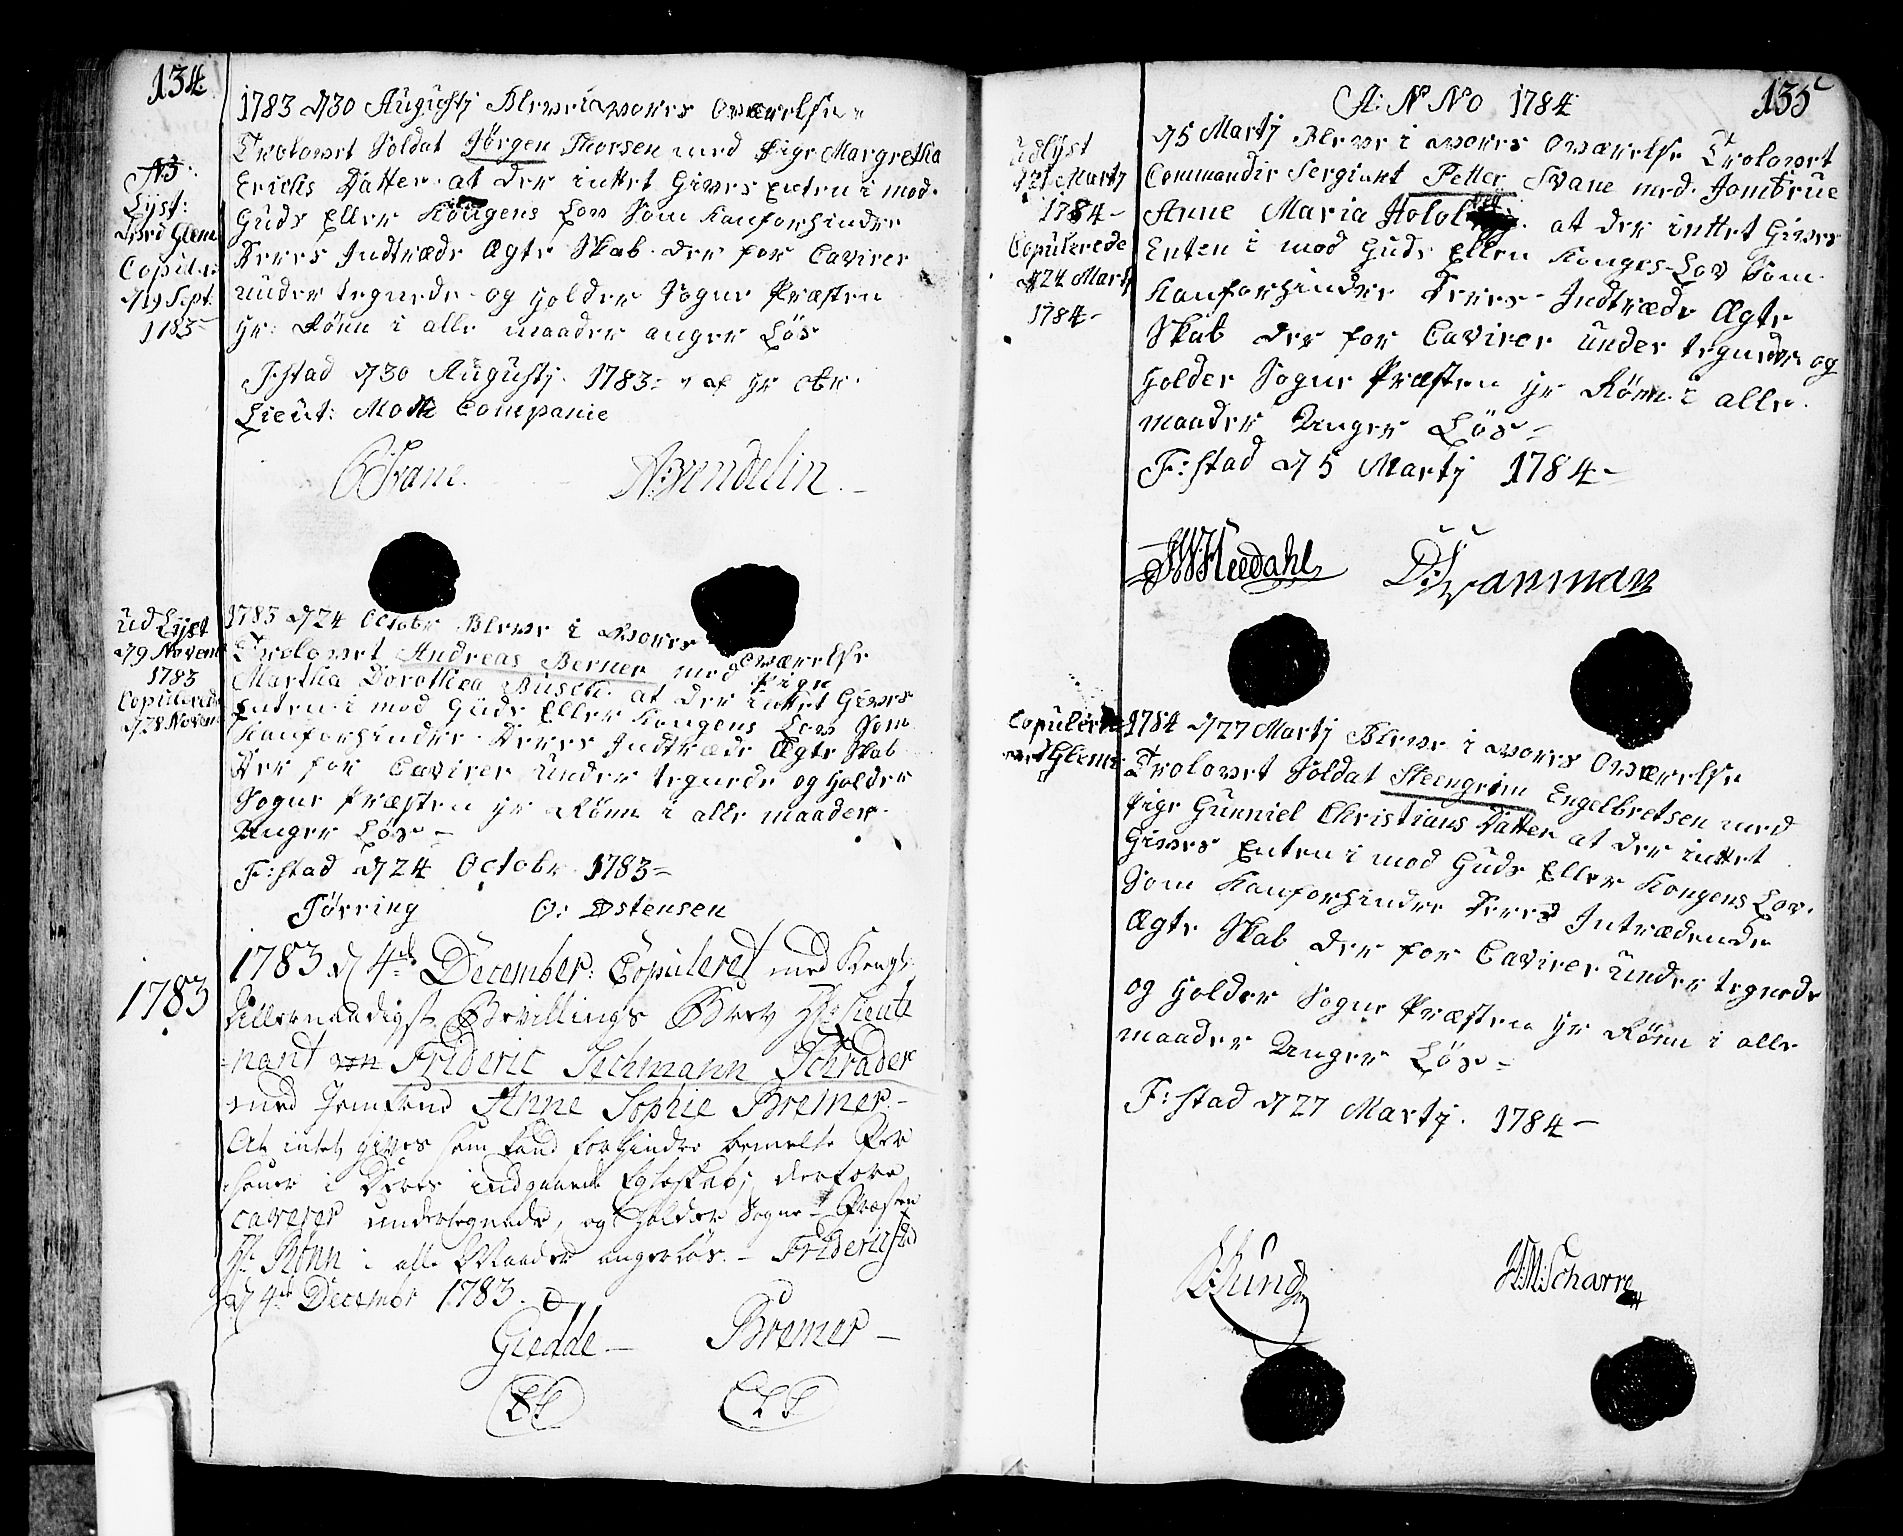 SAO, Fredrikstad prestekontor Kirkebøker, F/Fa/L0002: Ministerialbok nr. 2, 1750-1804, s. 134-135